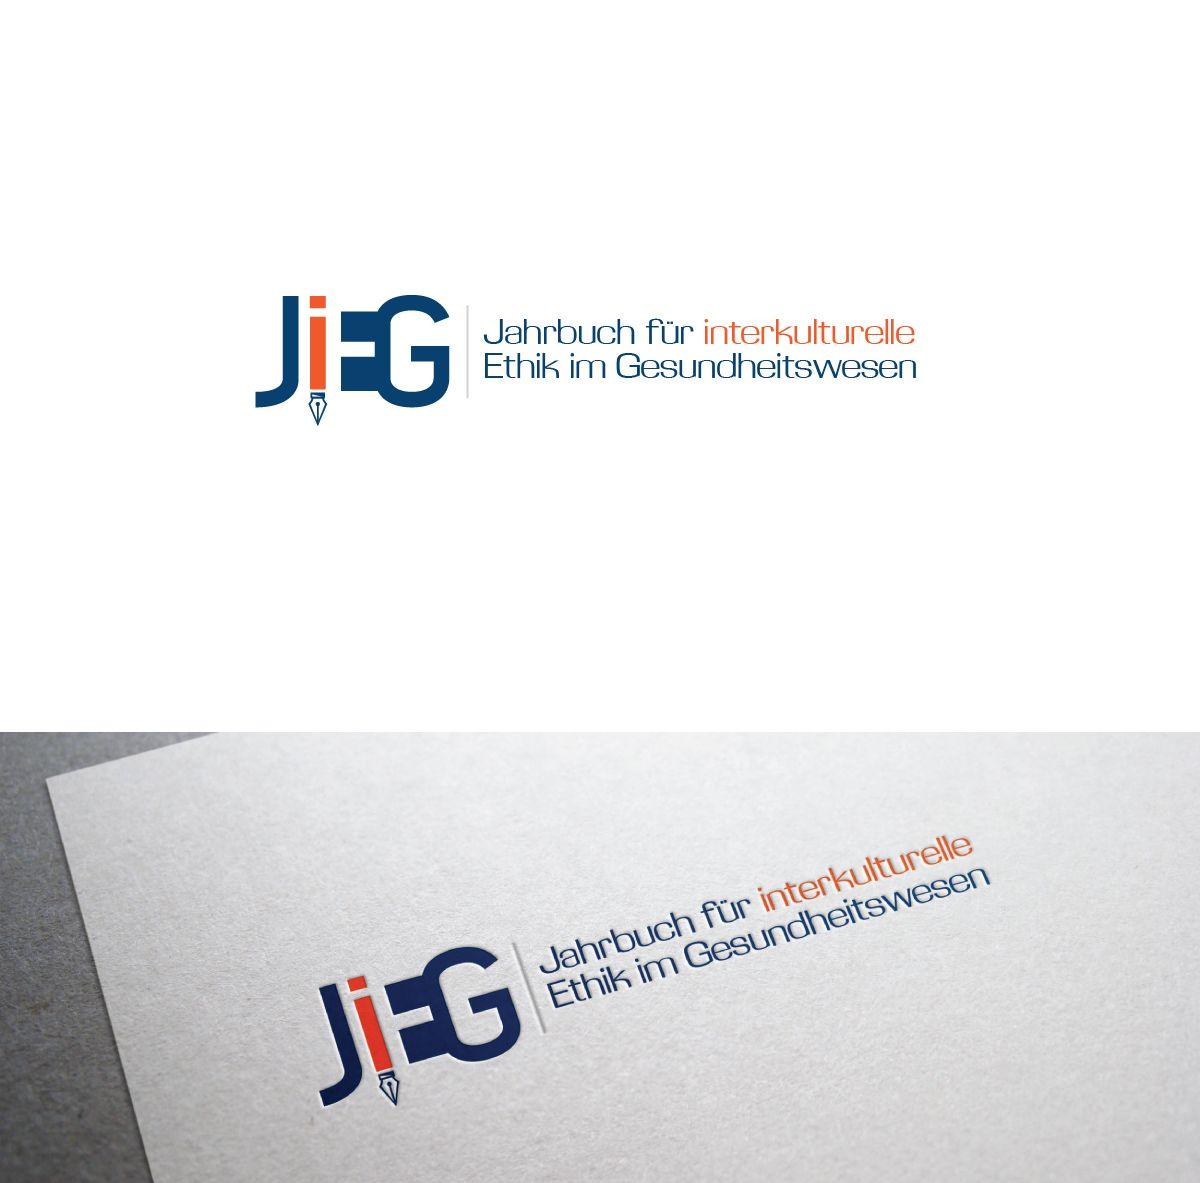 Logo for an academic Online-Publication Elegant, Serious Logo Design by Nadeem